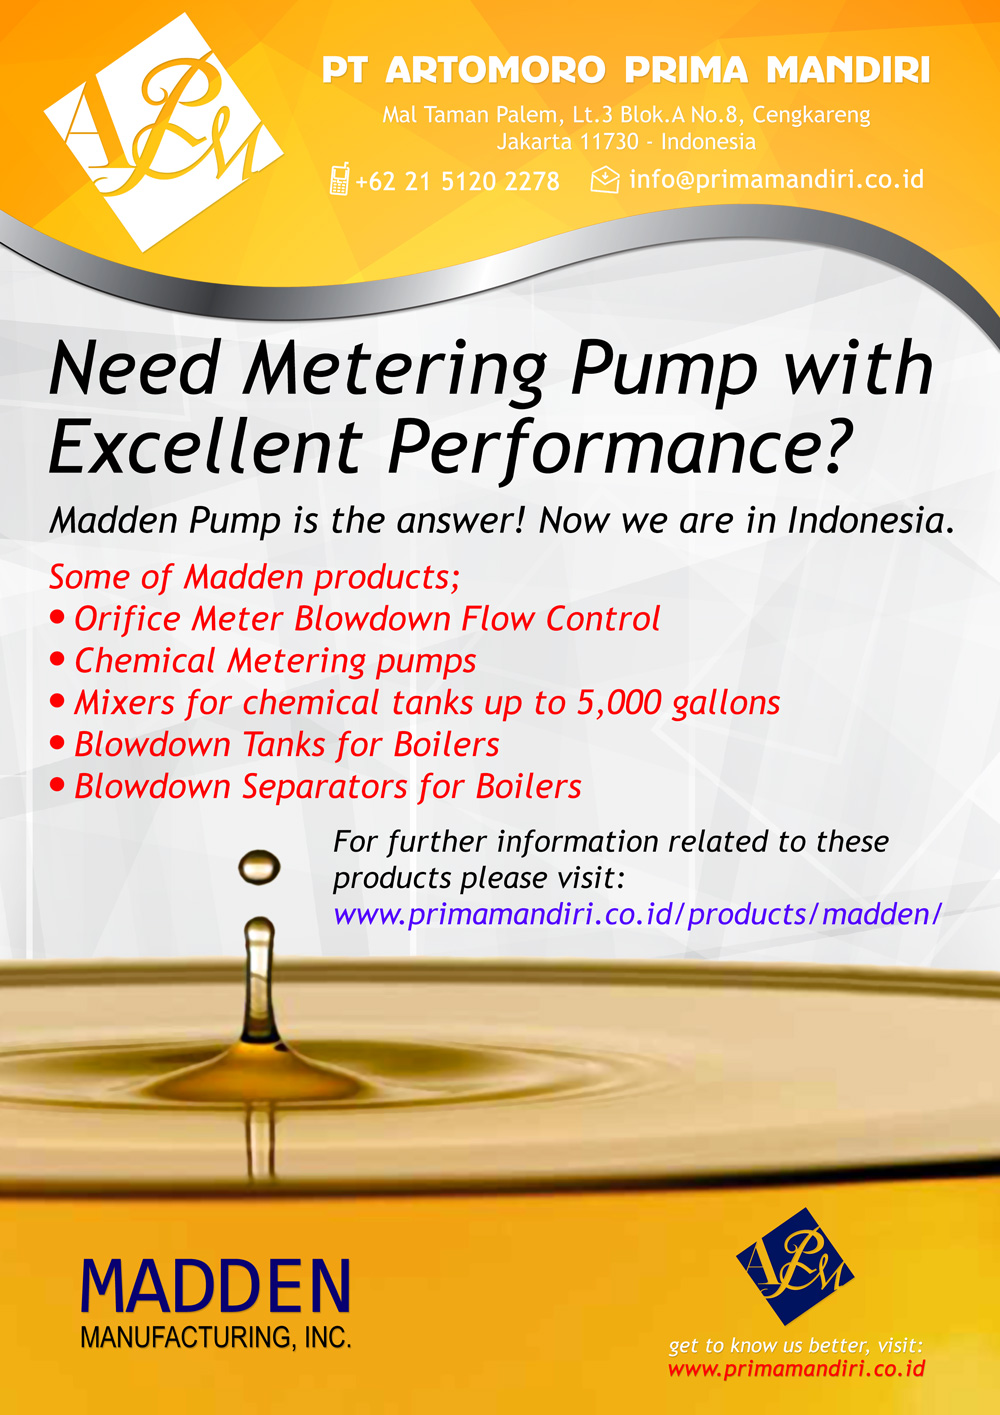 Madden Manufacturing - PT Artomoro Prima Mandiri